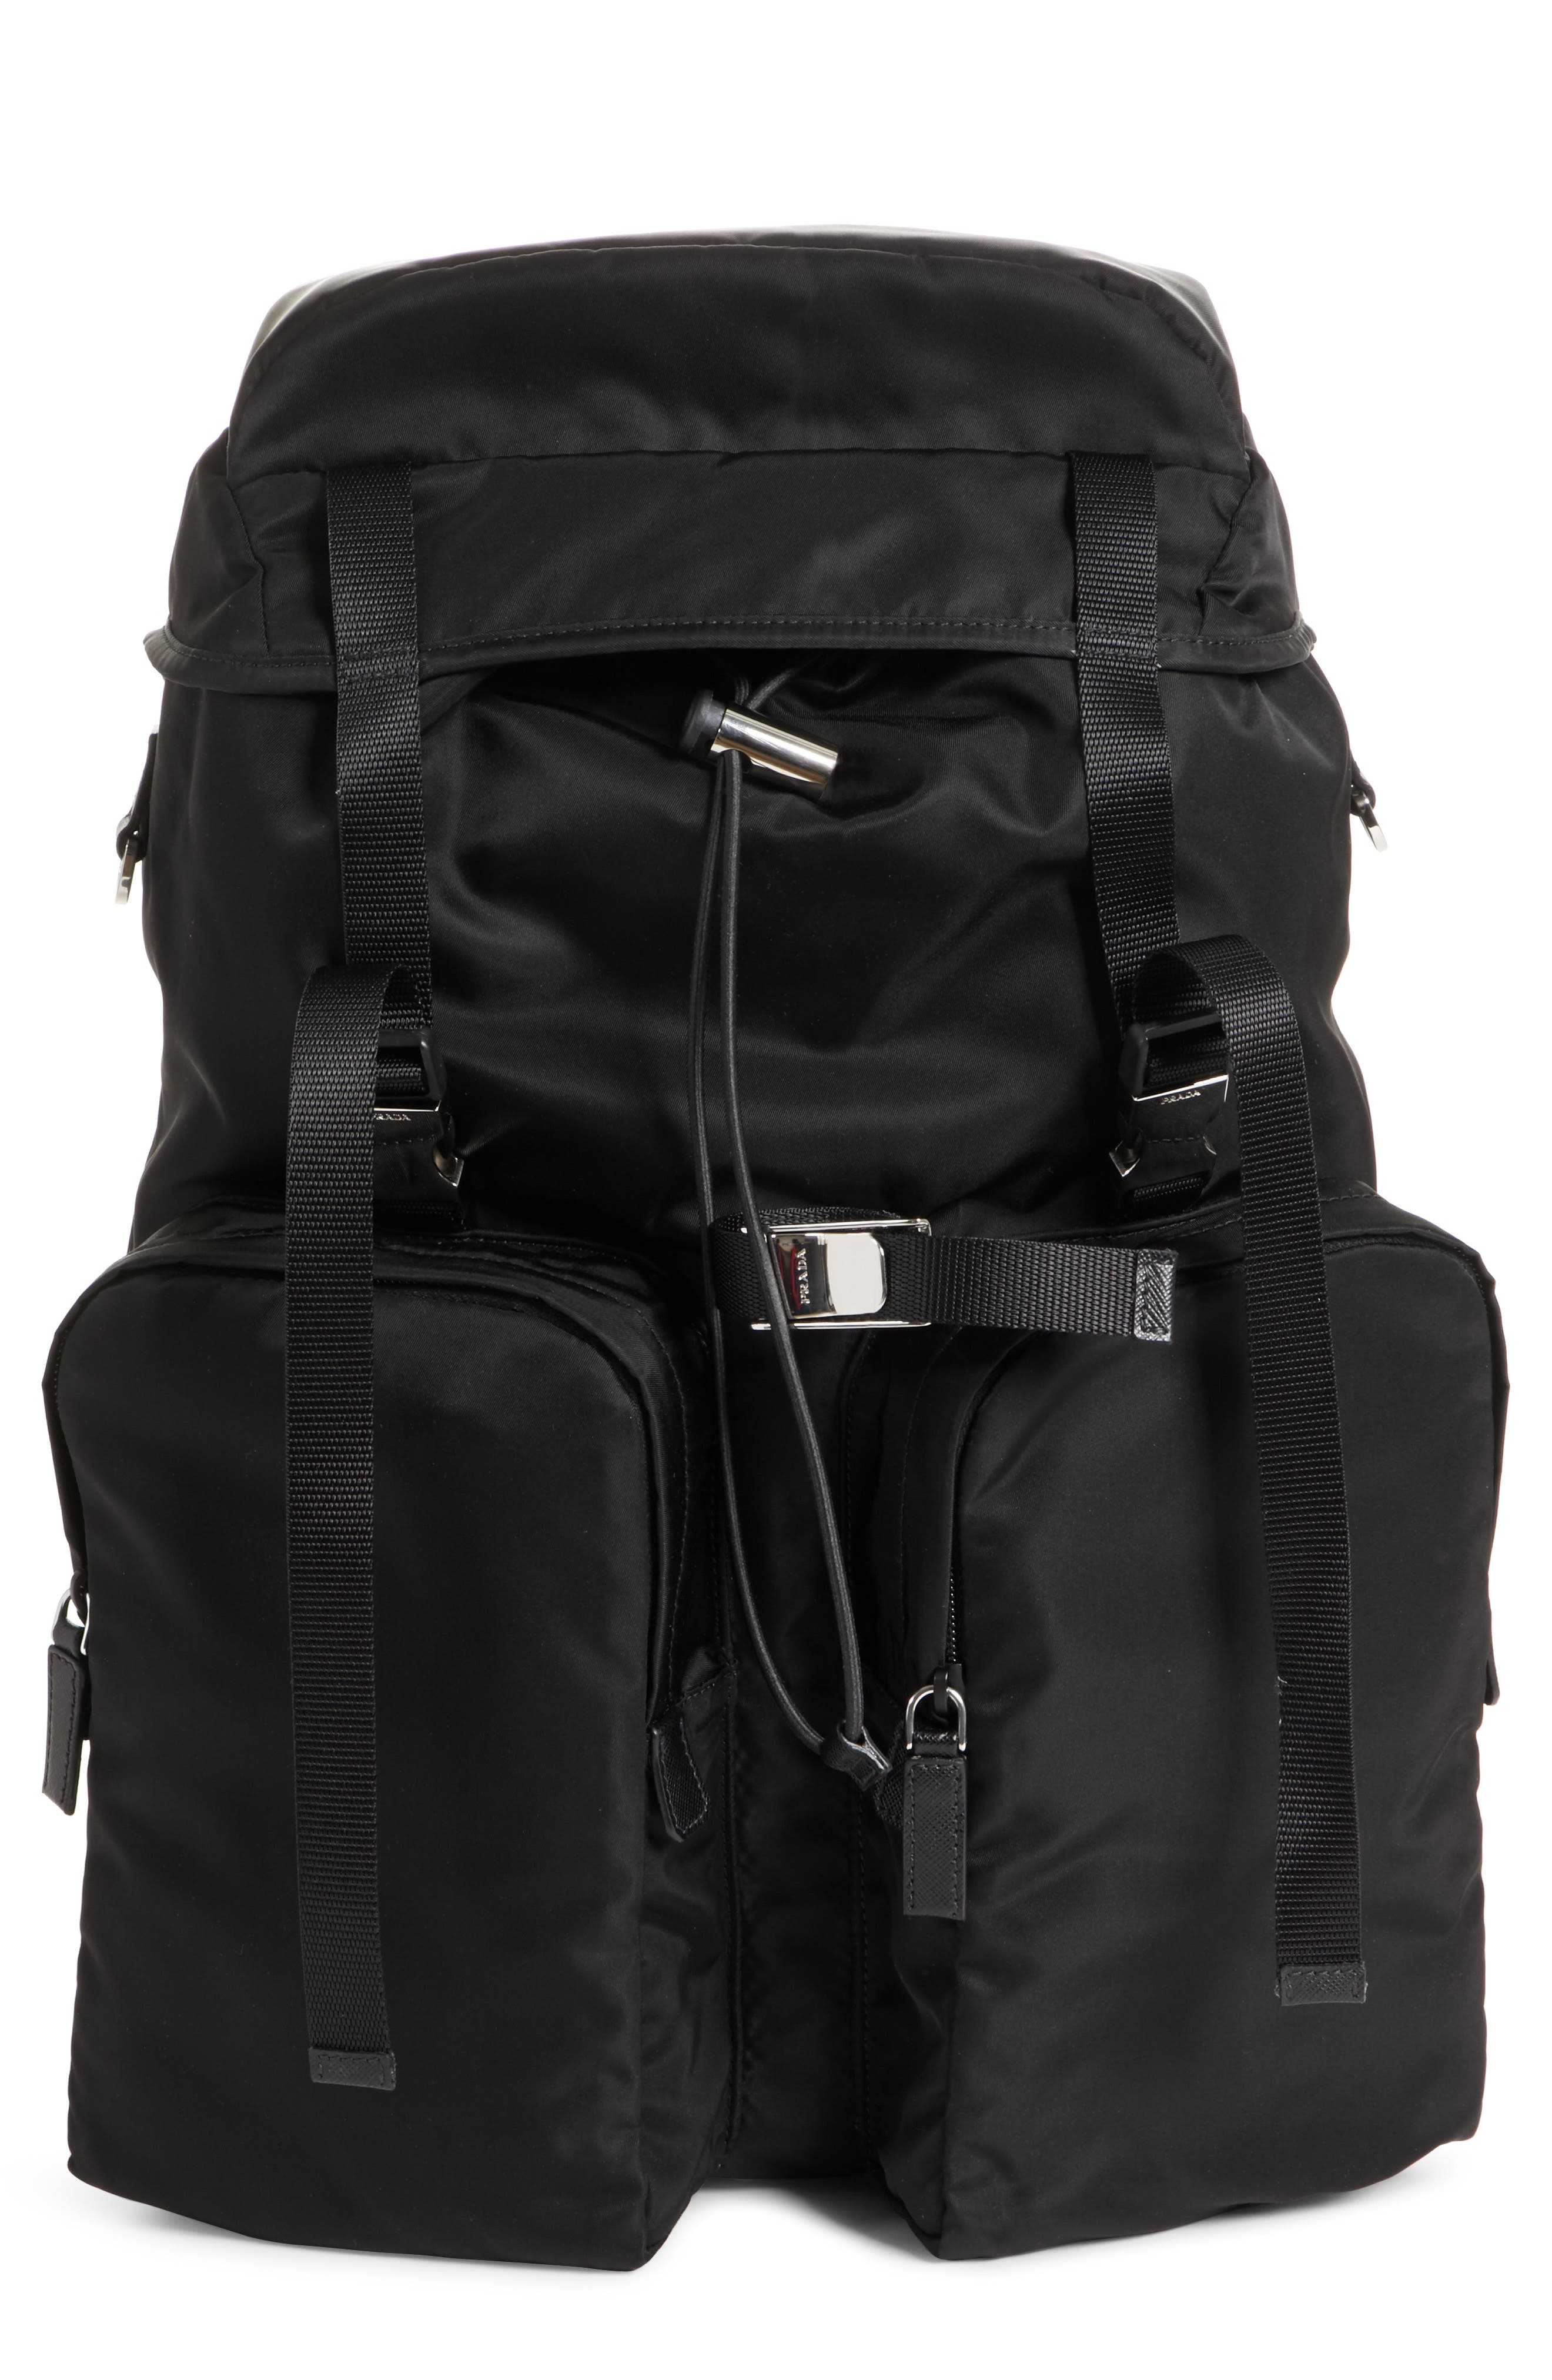 5e8f7ad5c6fc29 ... coupon prada montagna flap double pocket backpack 78efa 543d3